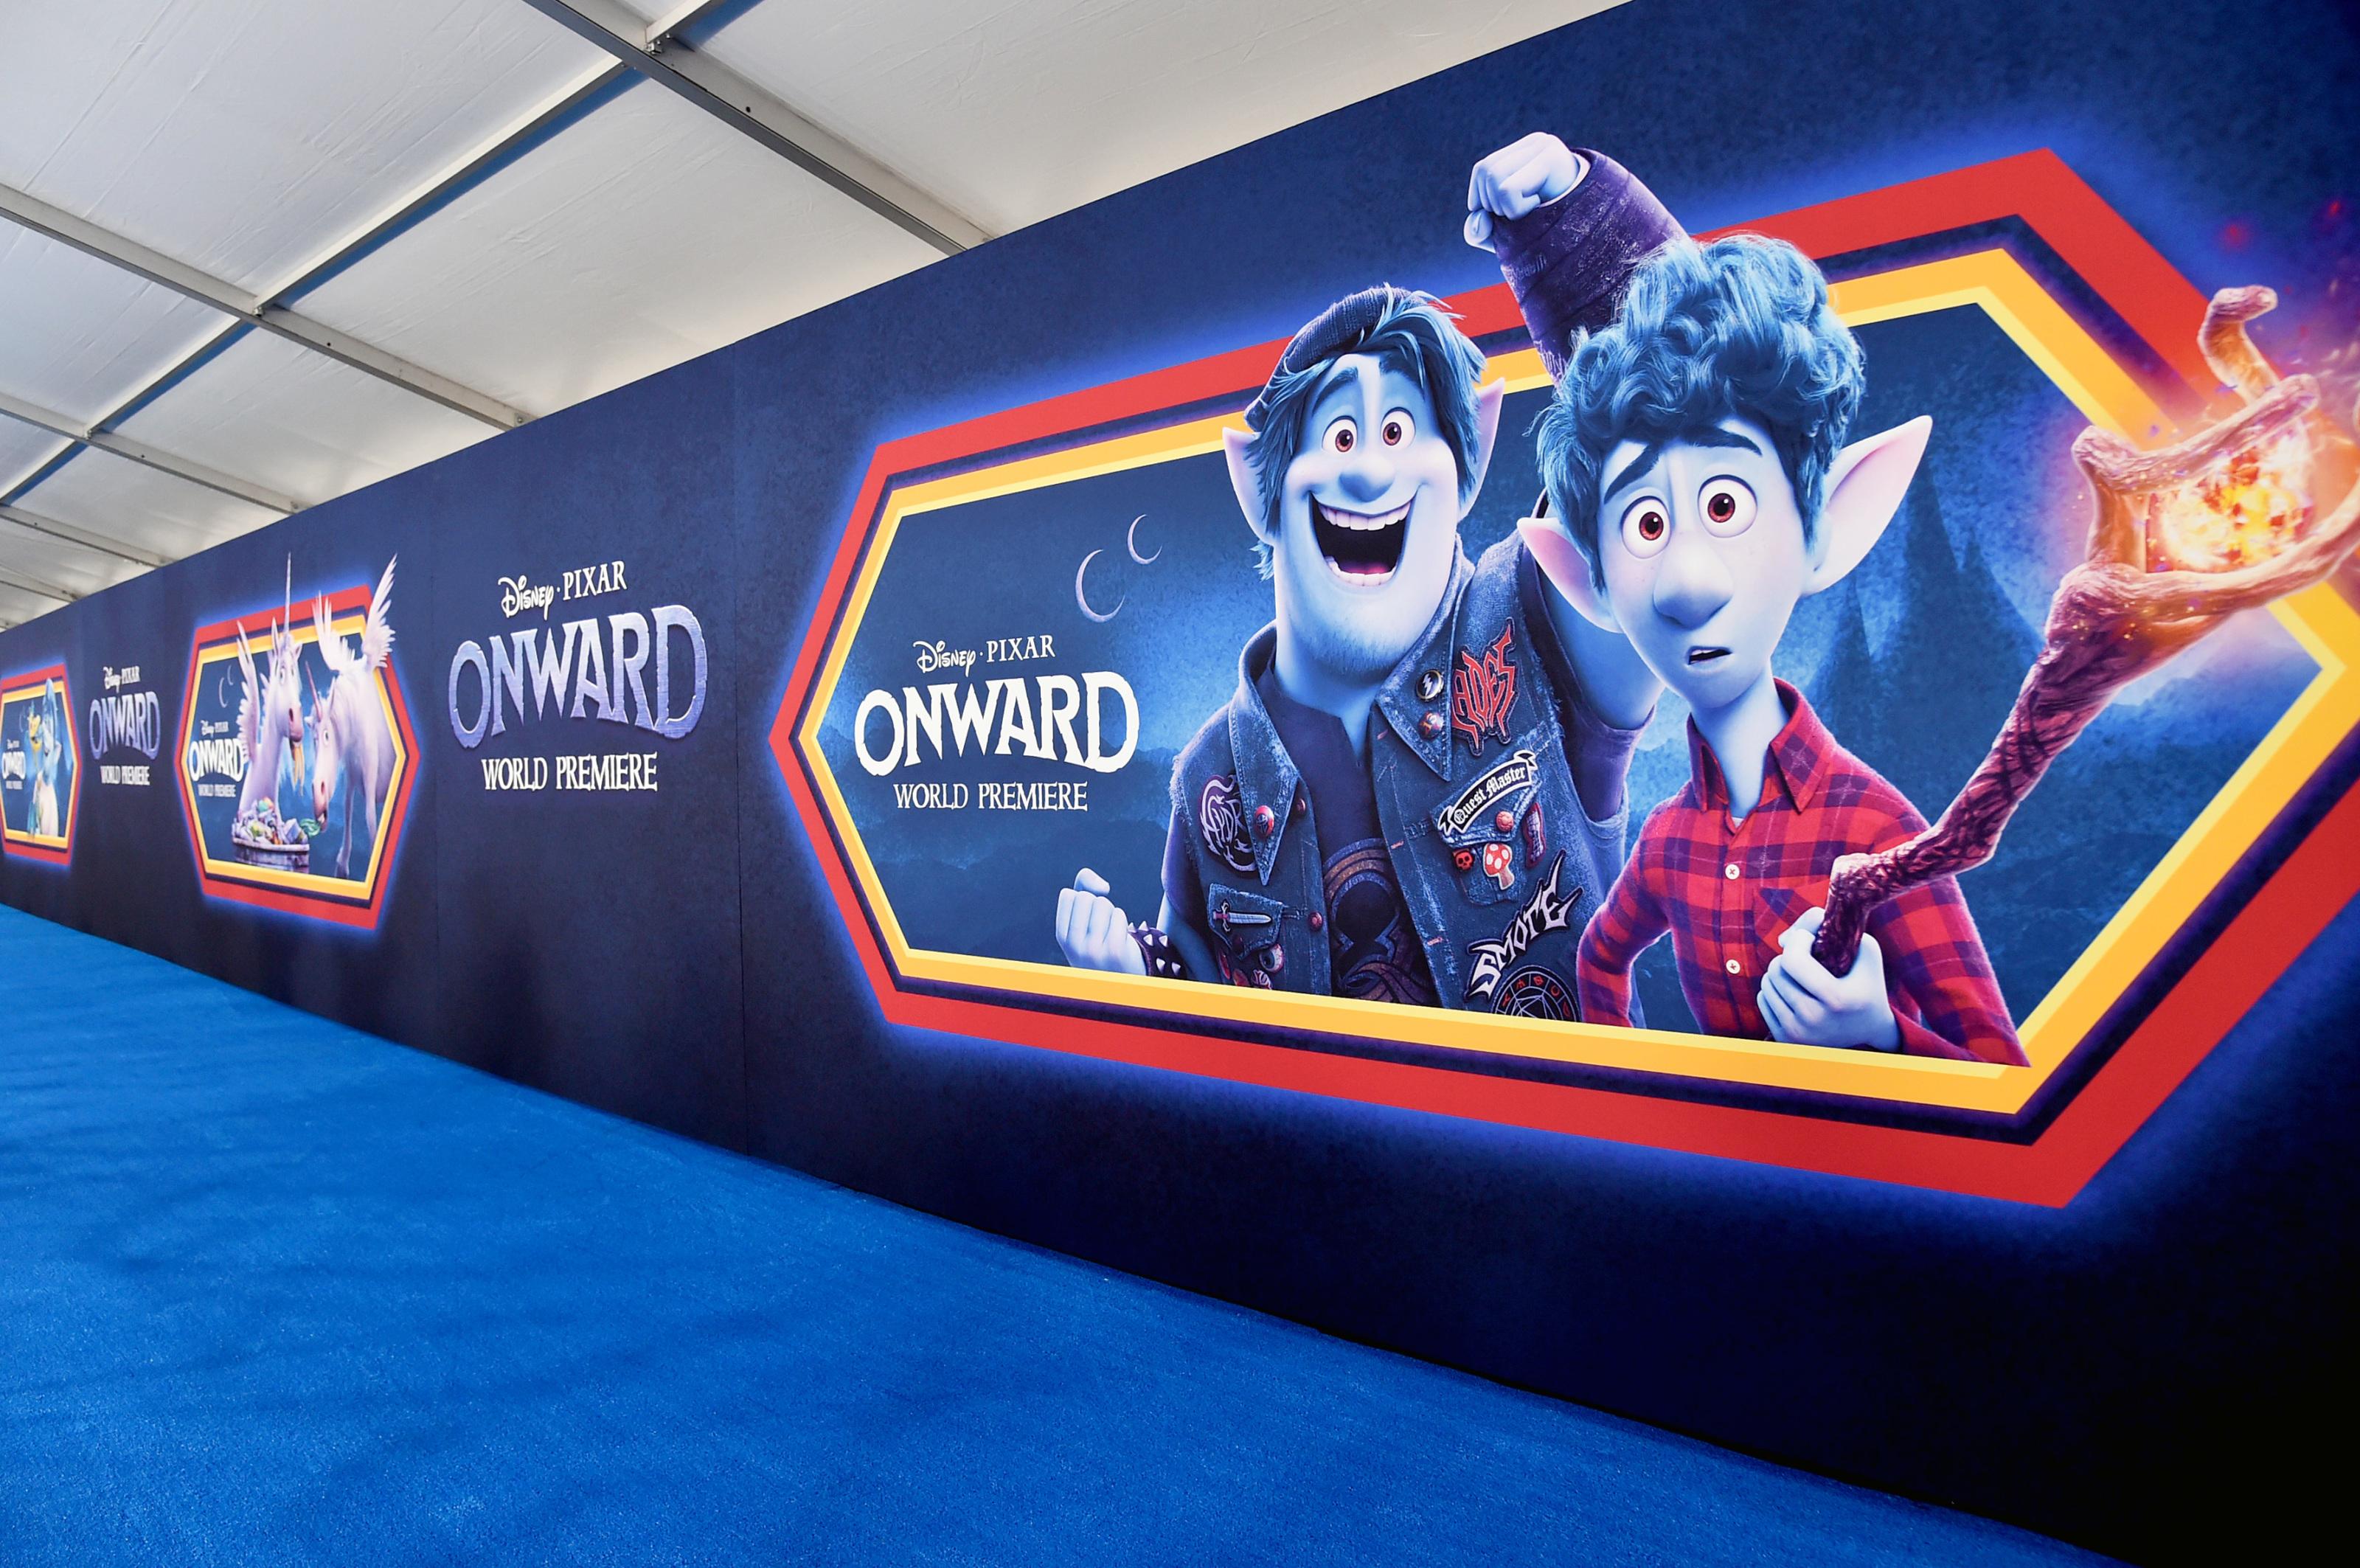 5 Pixar movies to watch on Disney Plus if you liked Onward